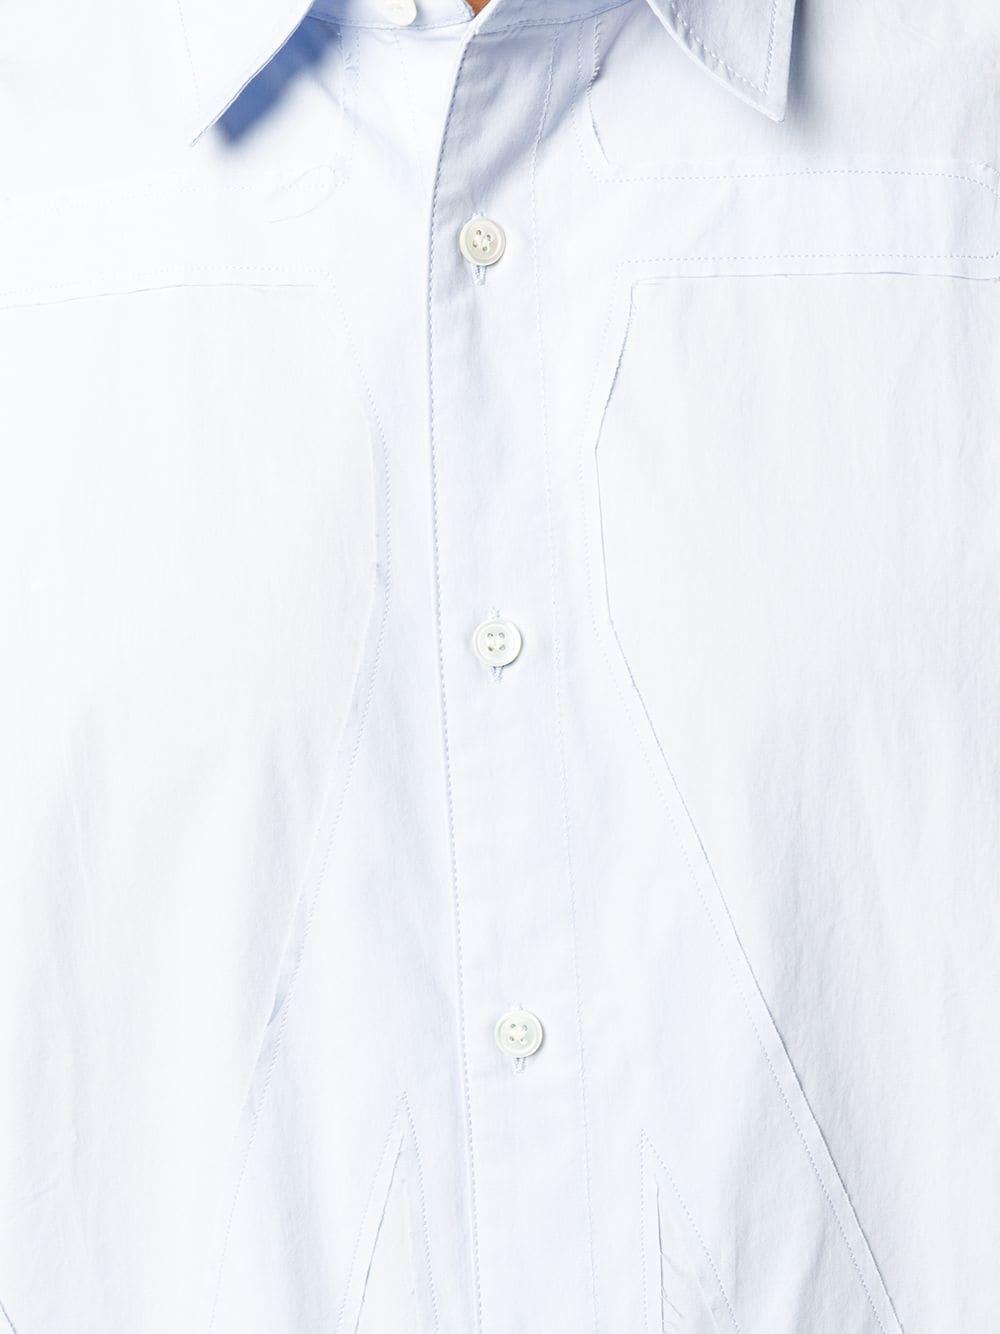 JW ANDERSON JW ANDERSON | Shirts | SH0045PG0189804